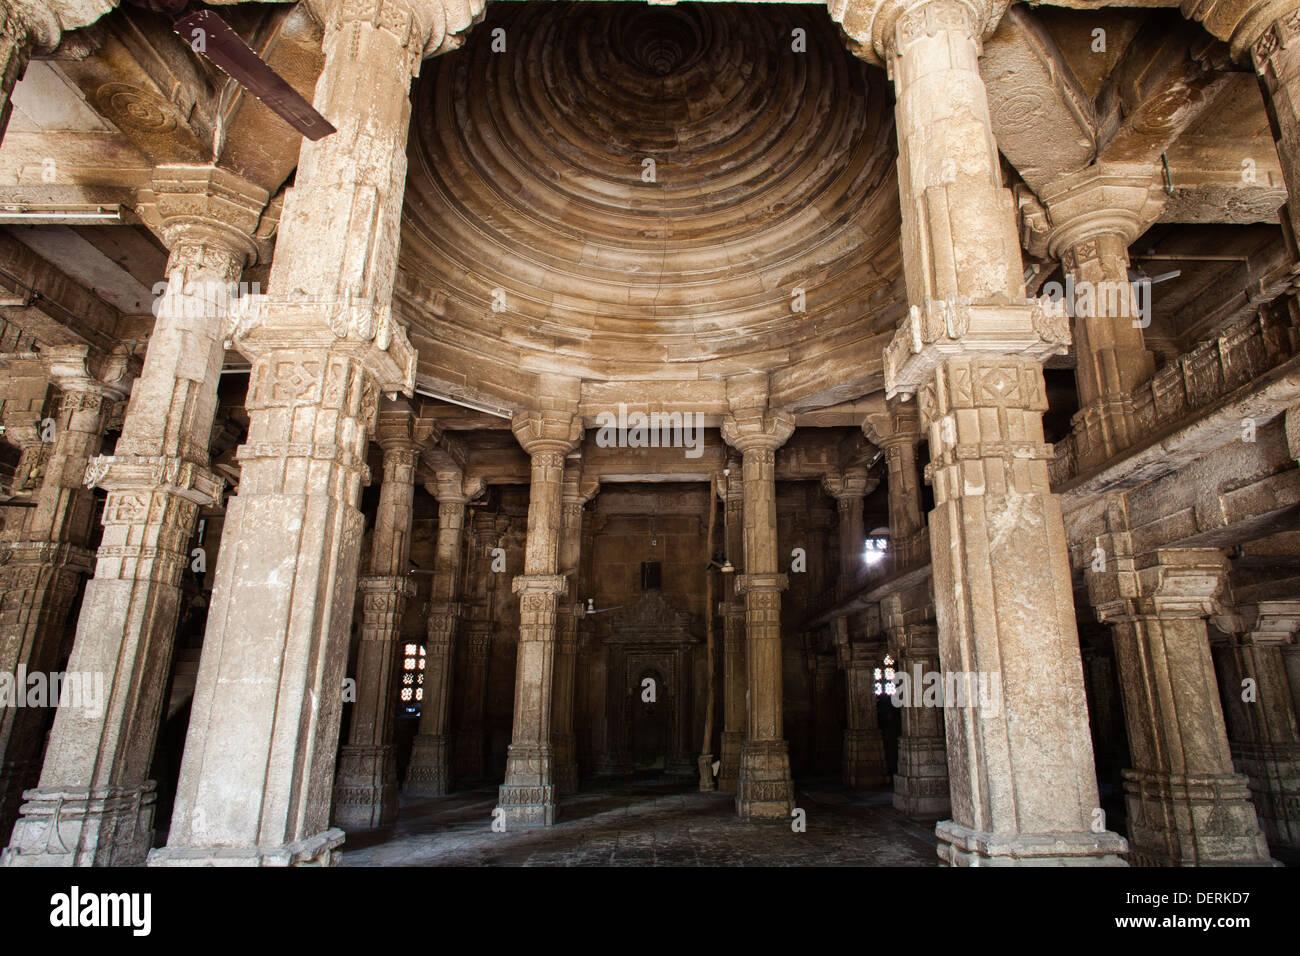 Interiors of a mosque, Jhulta Minara, Ahmedabad, Gujarat, India - Stock Image